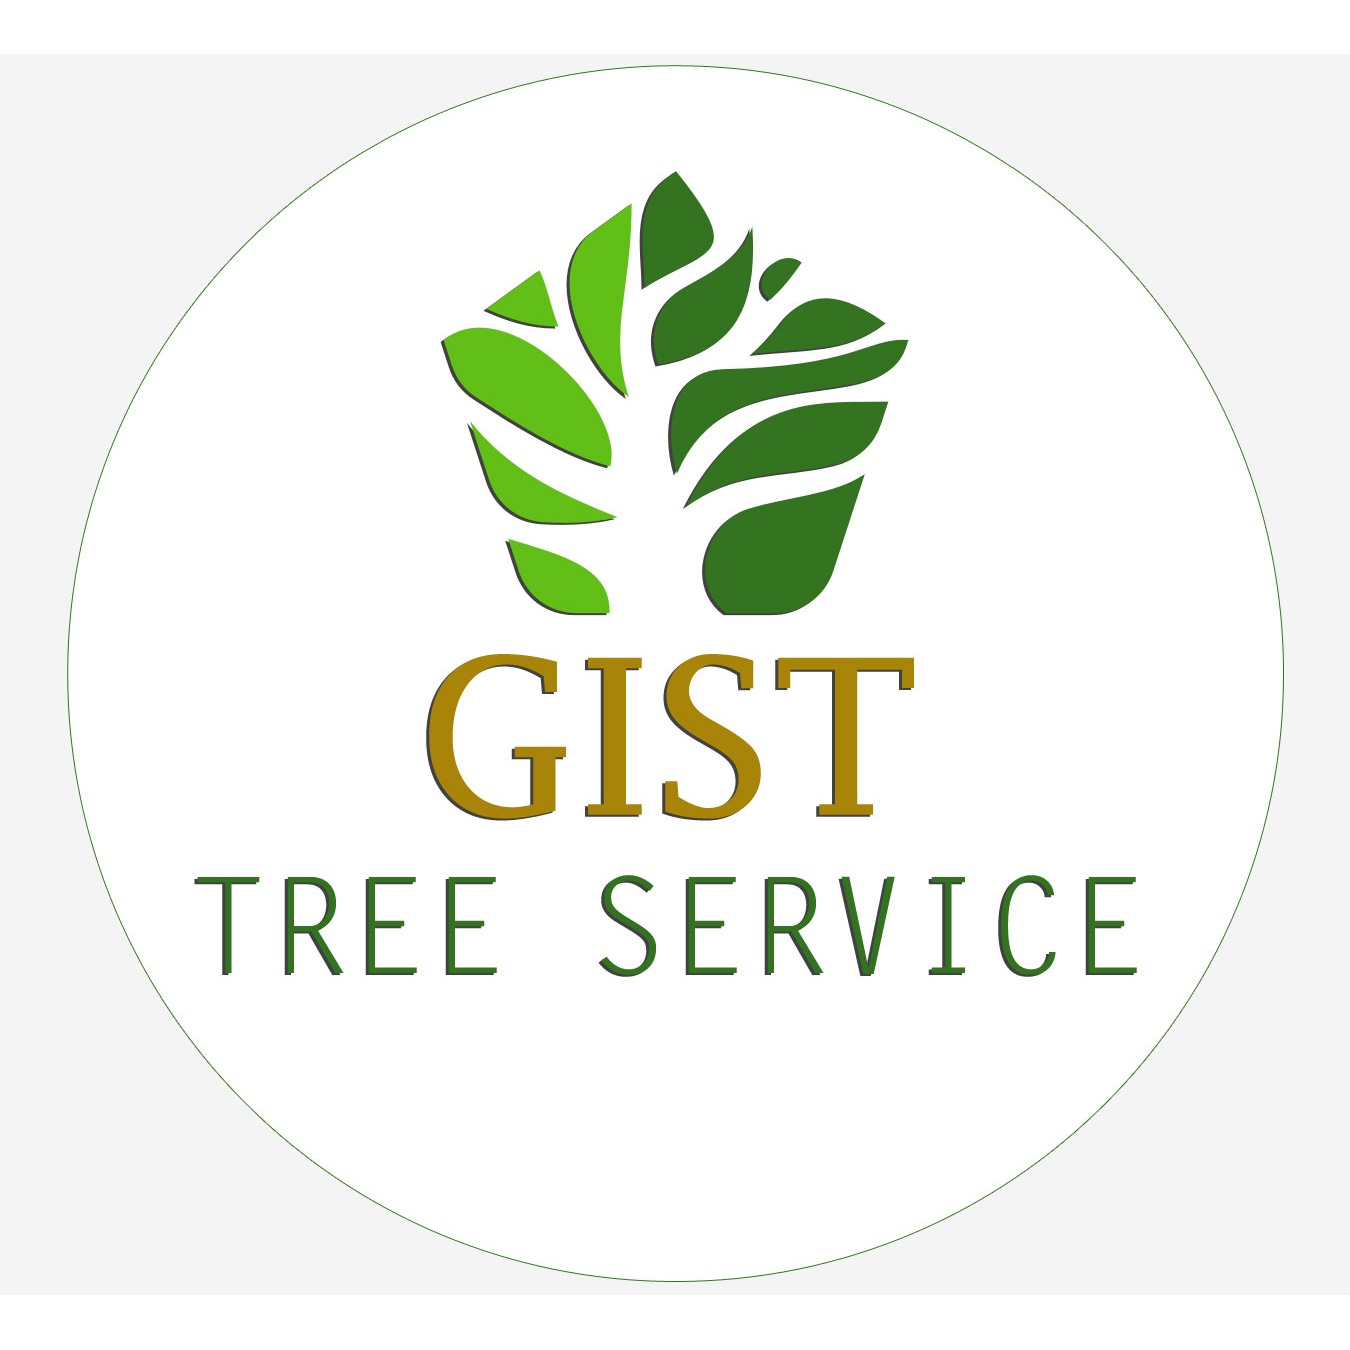 Gist Tree Service